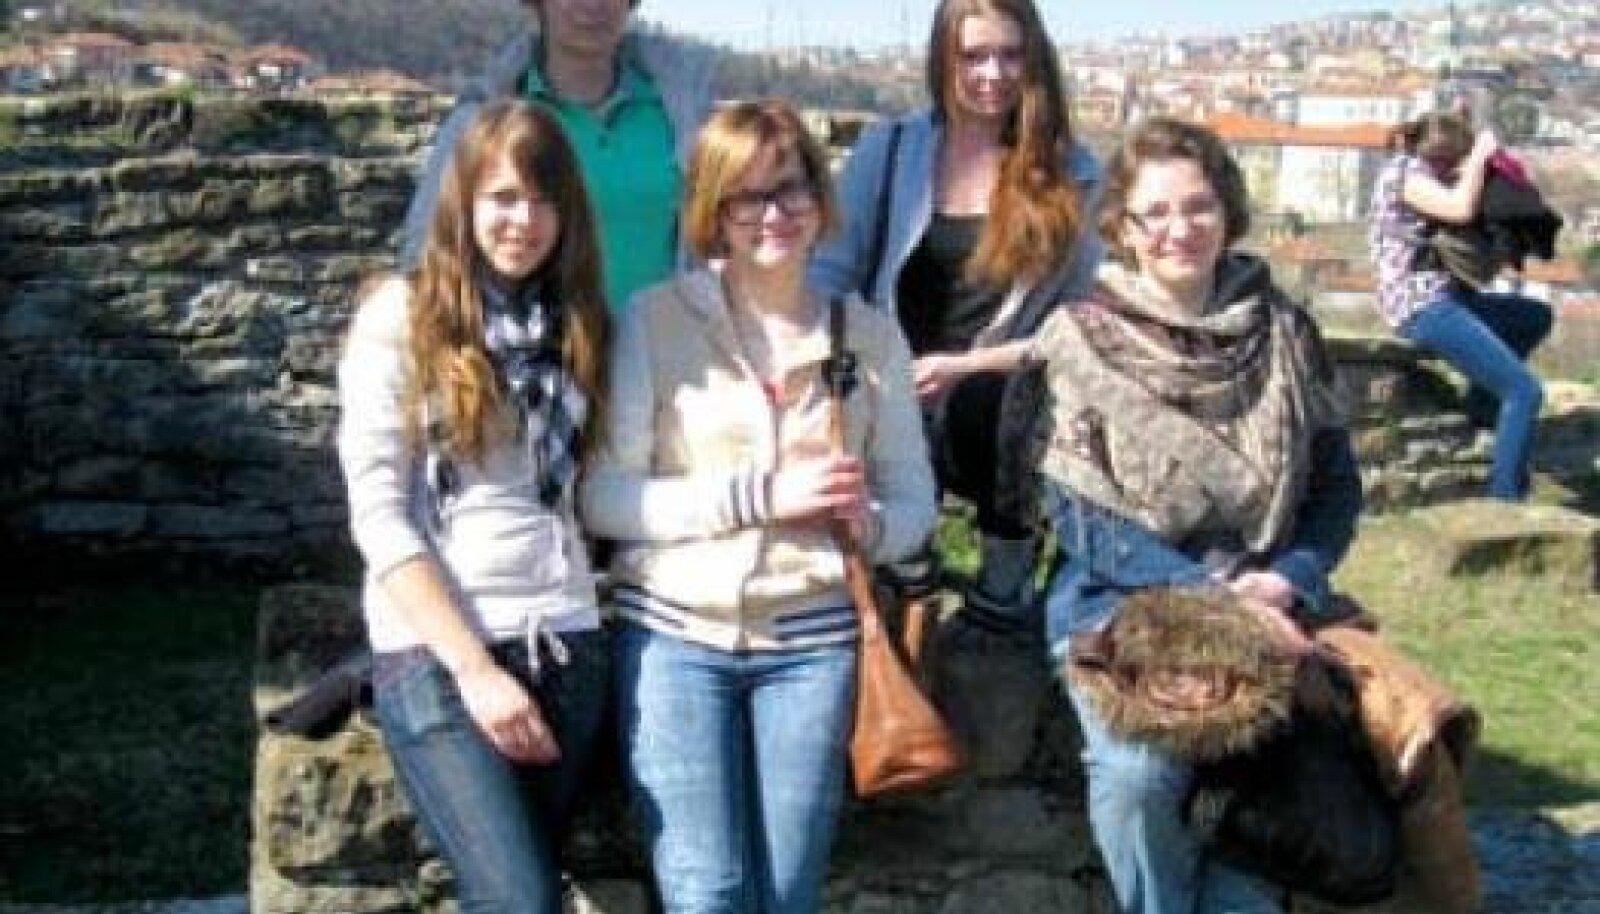 Projektis osalejad Veliko Tarnovos Tsarevetsi mäel